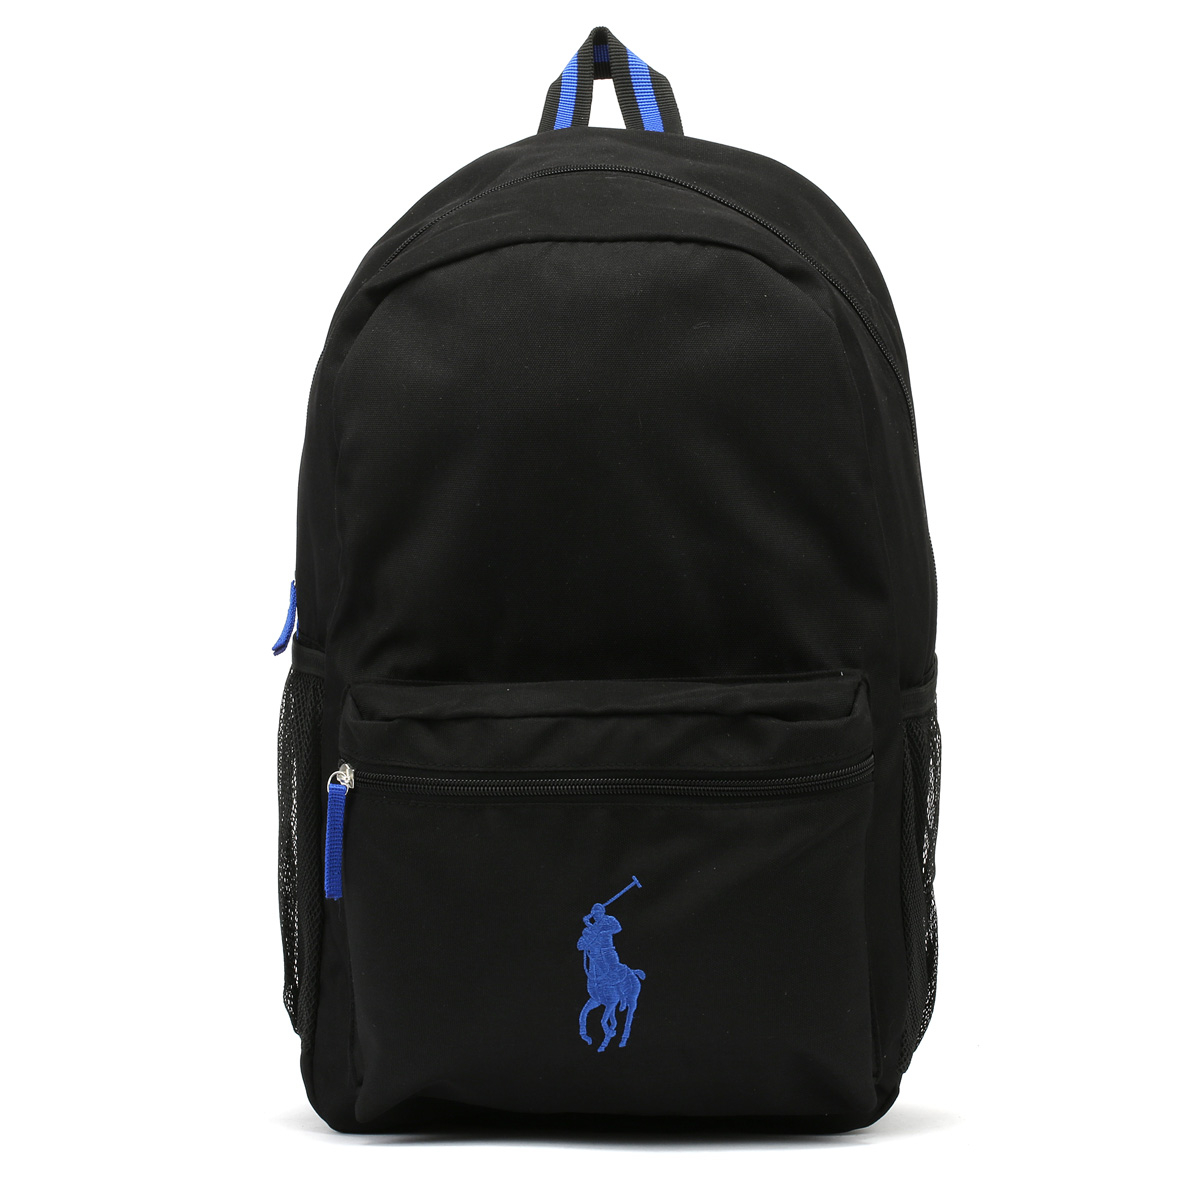 3ef78e52e583 Ralph lauren black royal academy backpack unisex travel school work bag jpg  1200x1200 Ralph lauren school